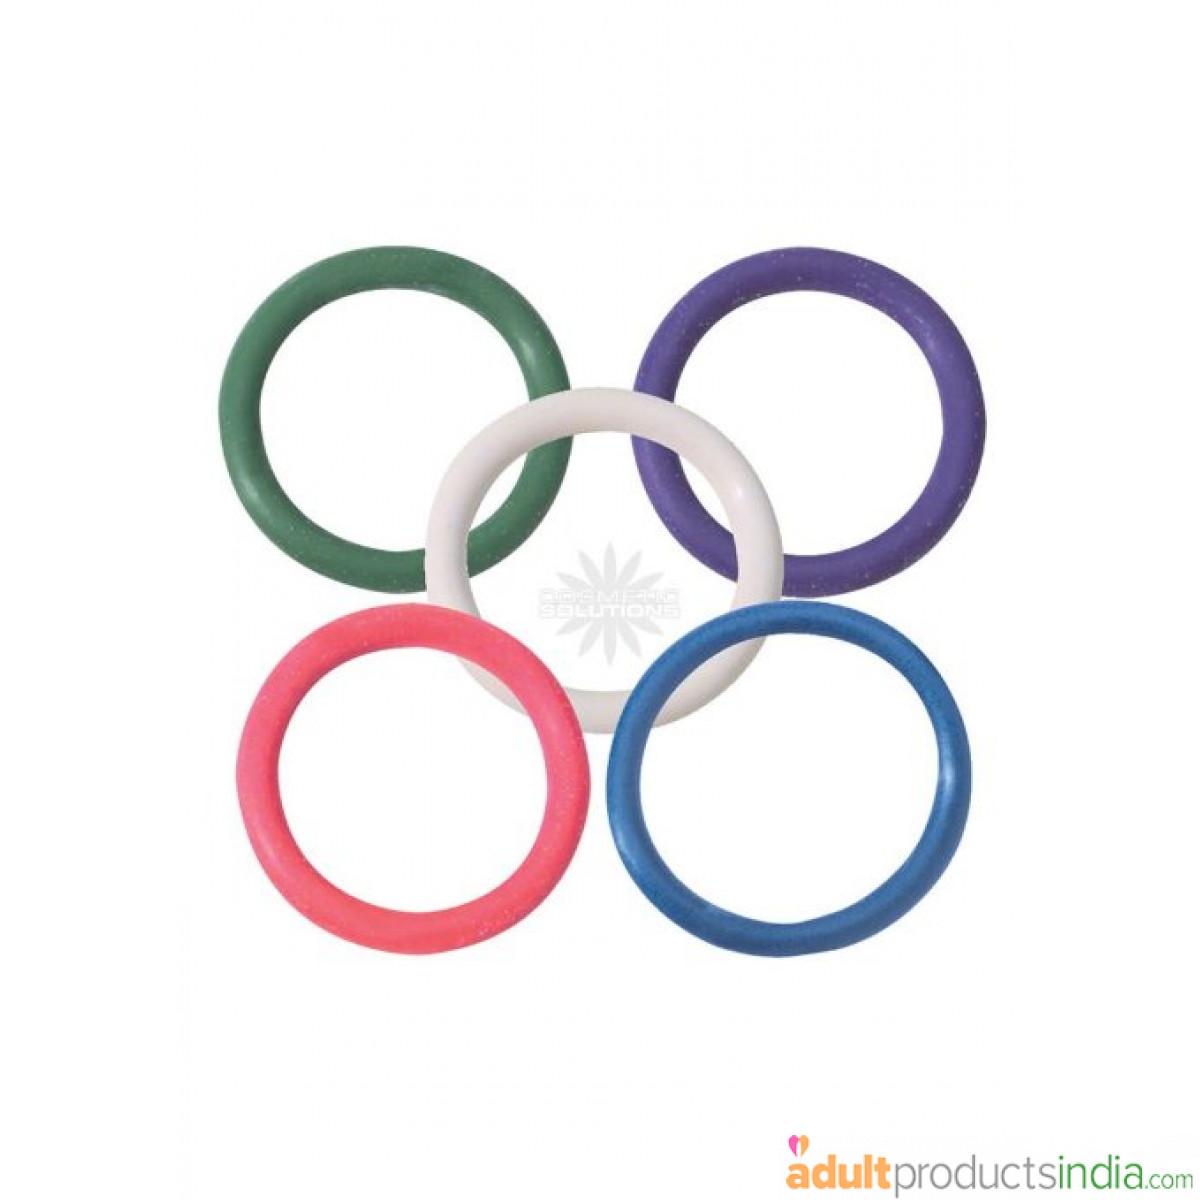 SPARTACUS - Rainbow Rubber C Ring 5 Pack